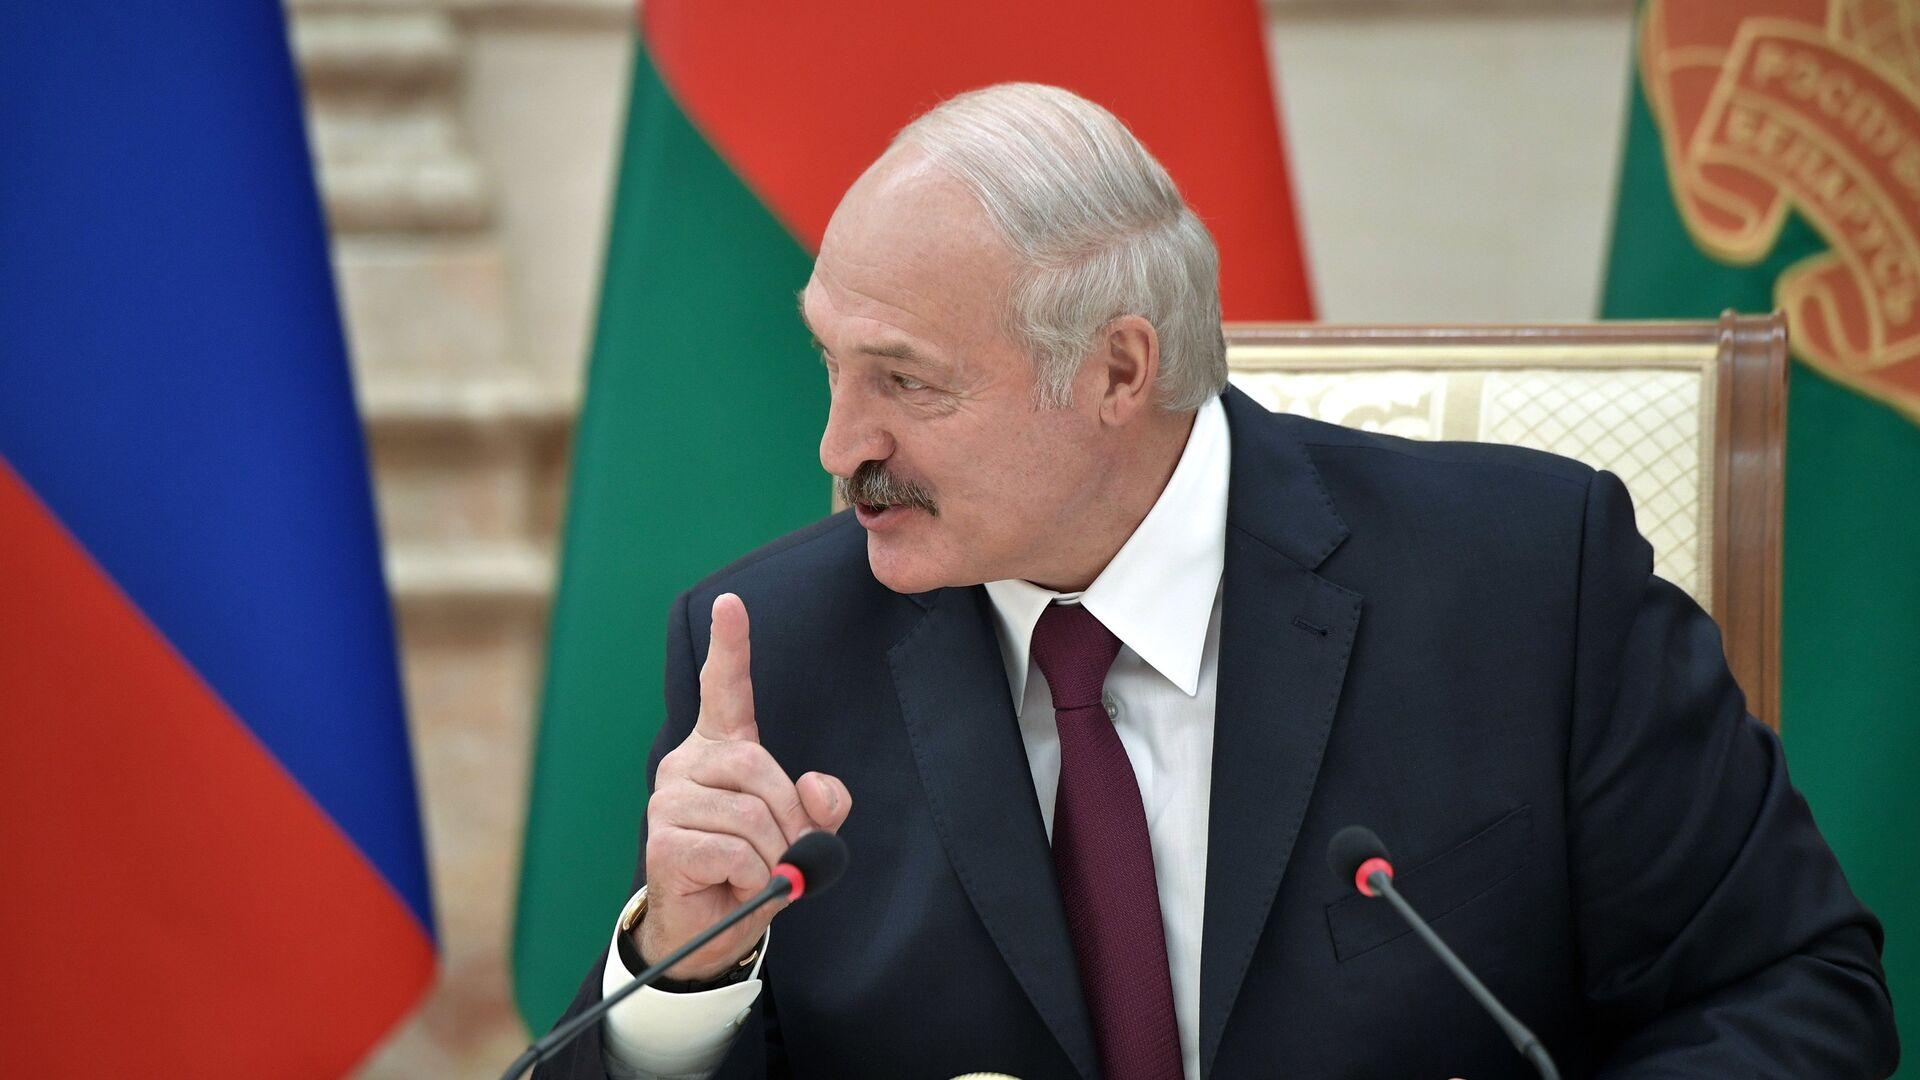 Александар Лукашенко - Sputnik Србија, 1920, 06.07.2021